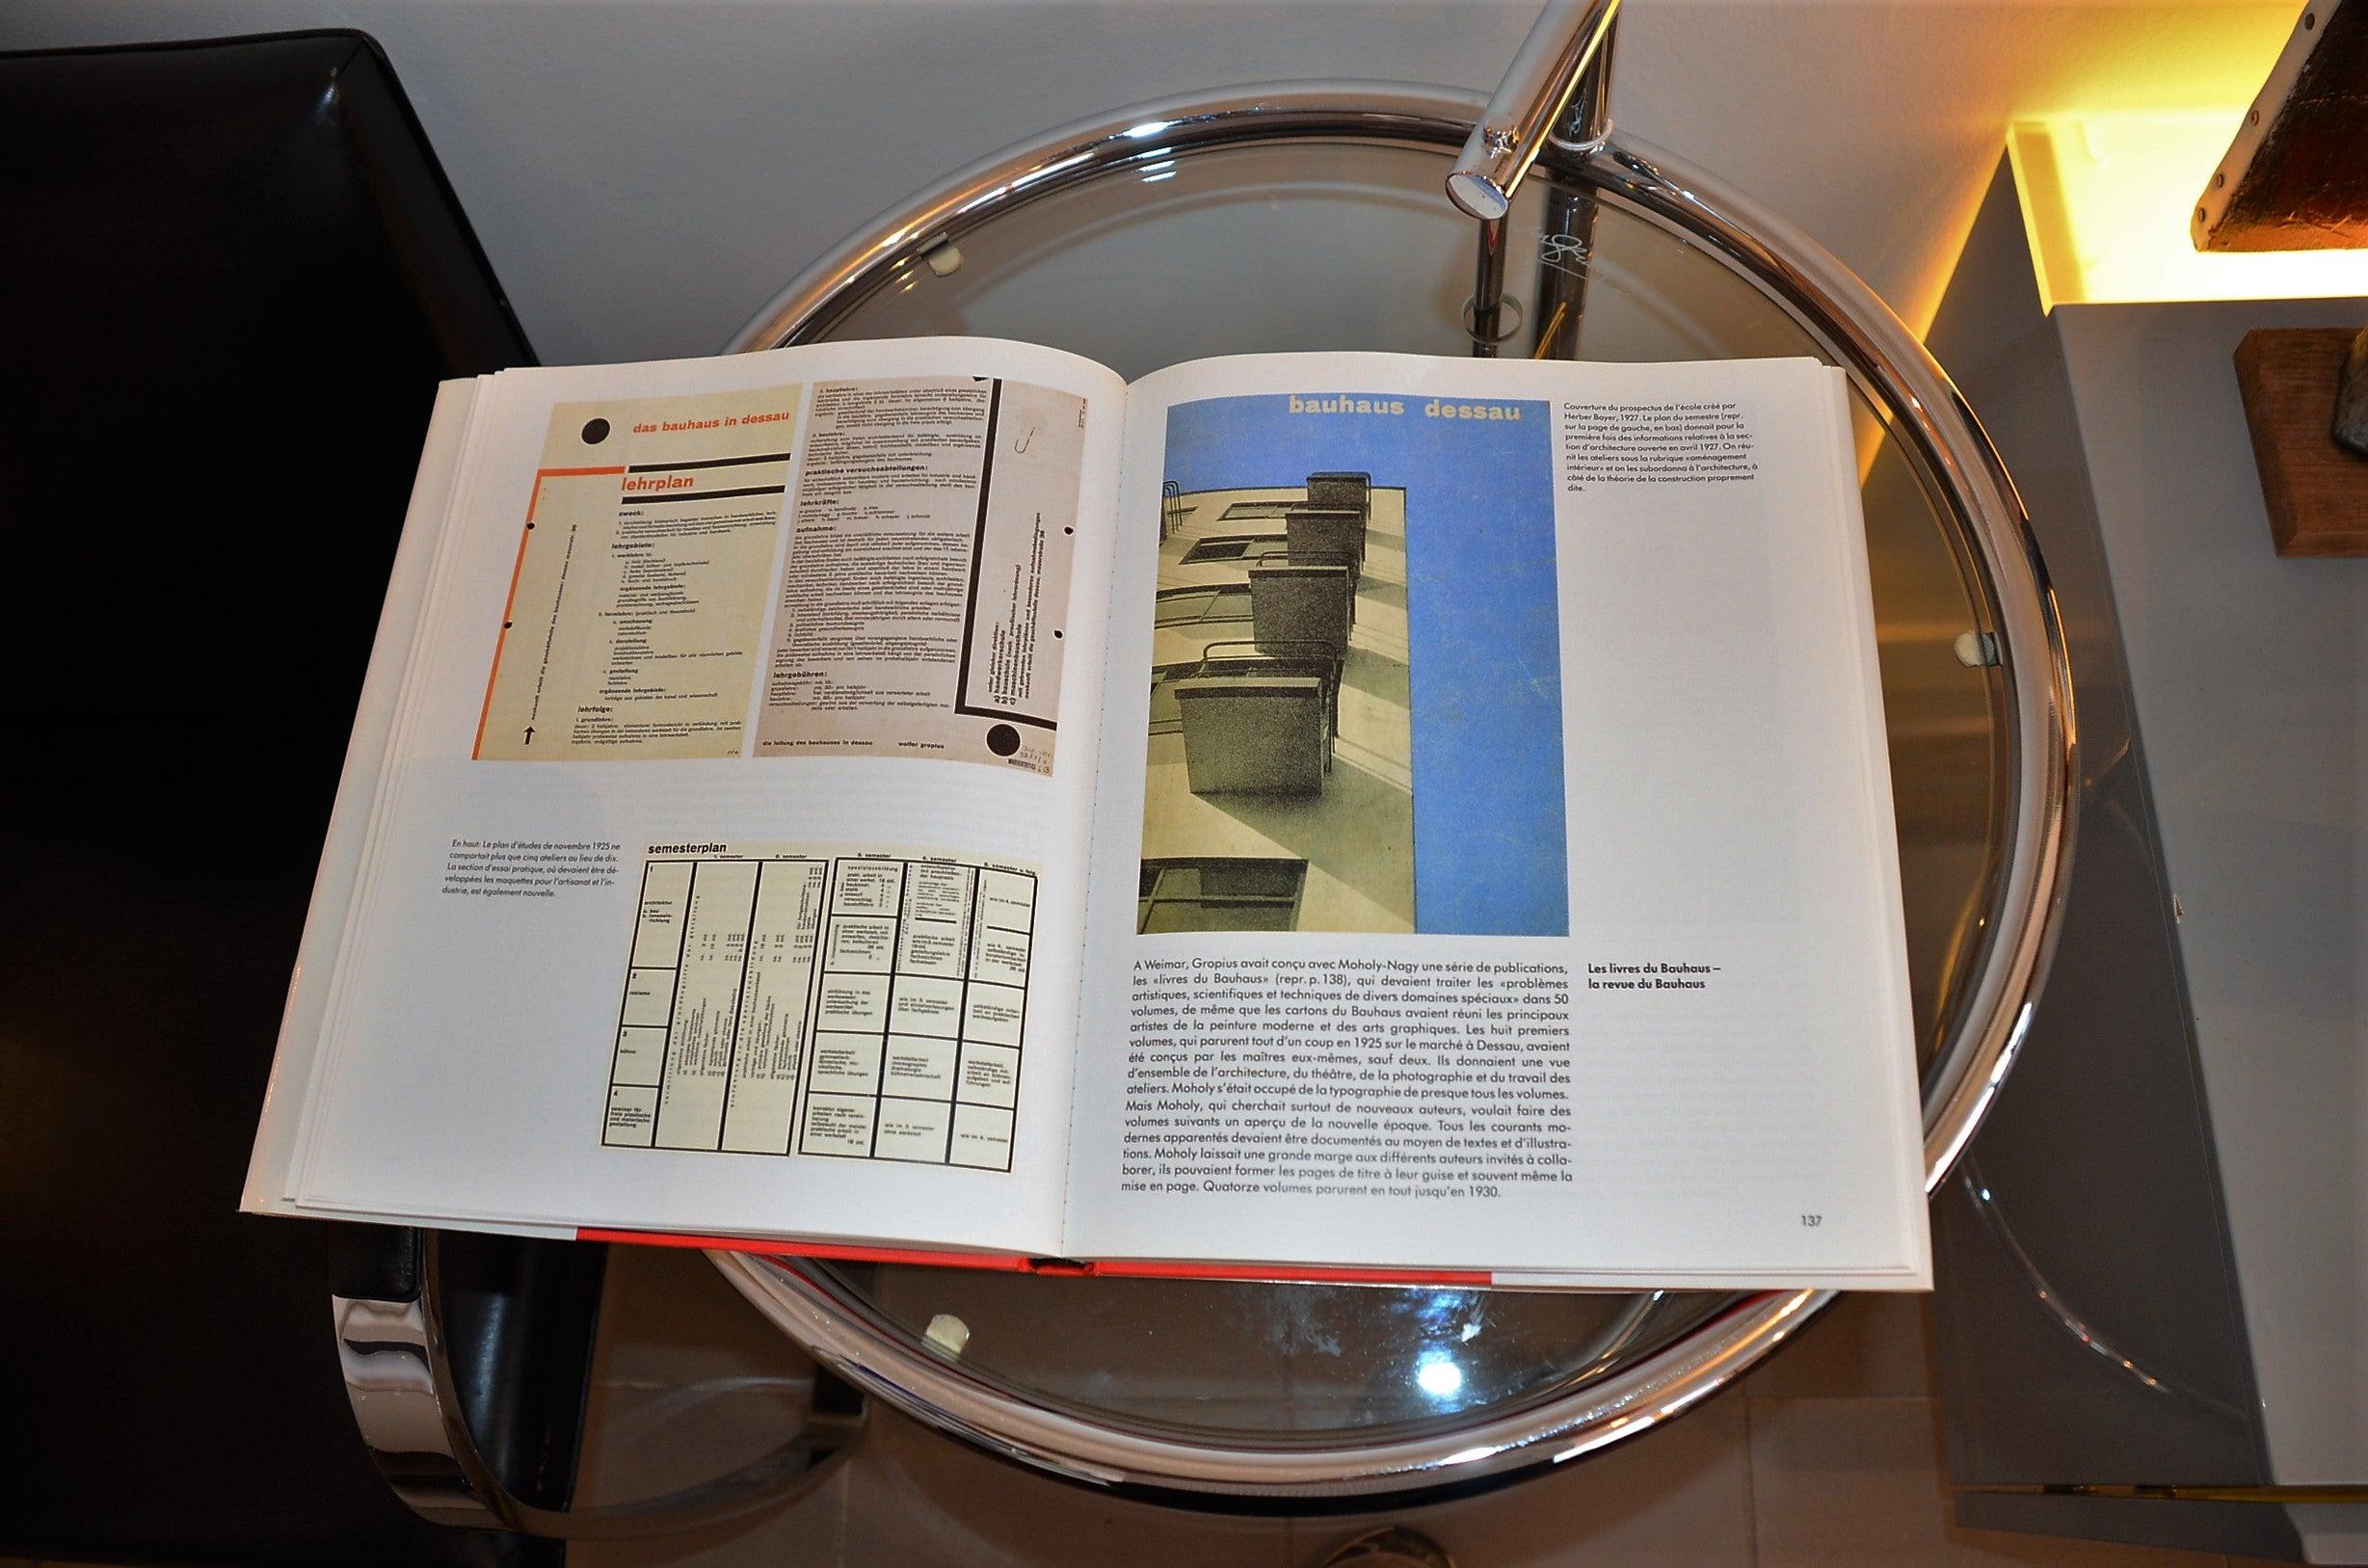 Bauhaus Interieur.